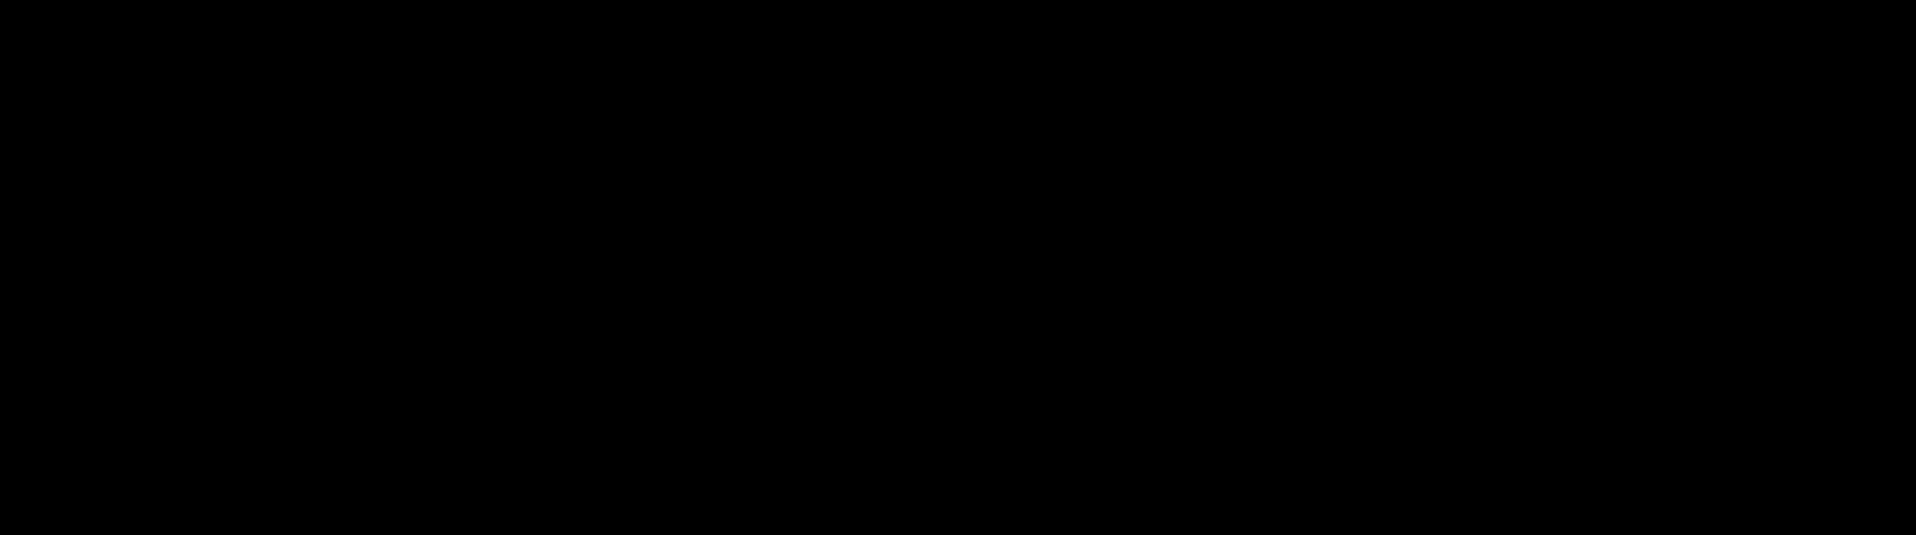 6-Chloro-3-indolyl-β-D-glucuronide cyclohexylammonium salt